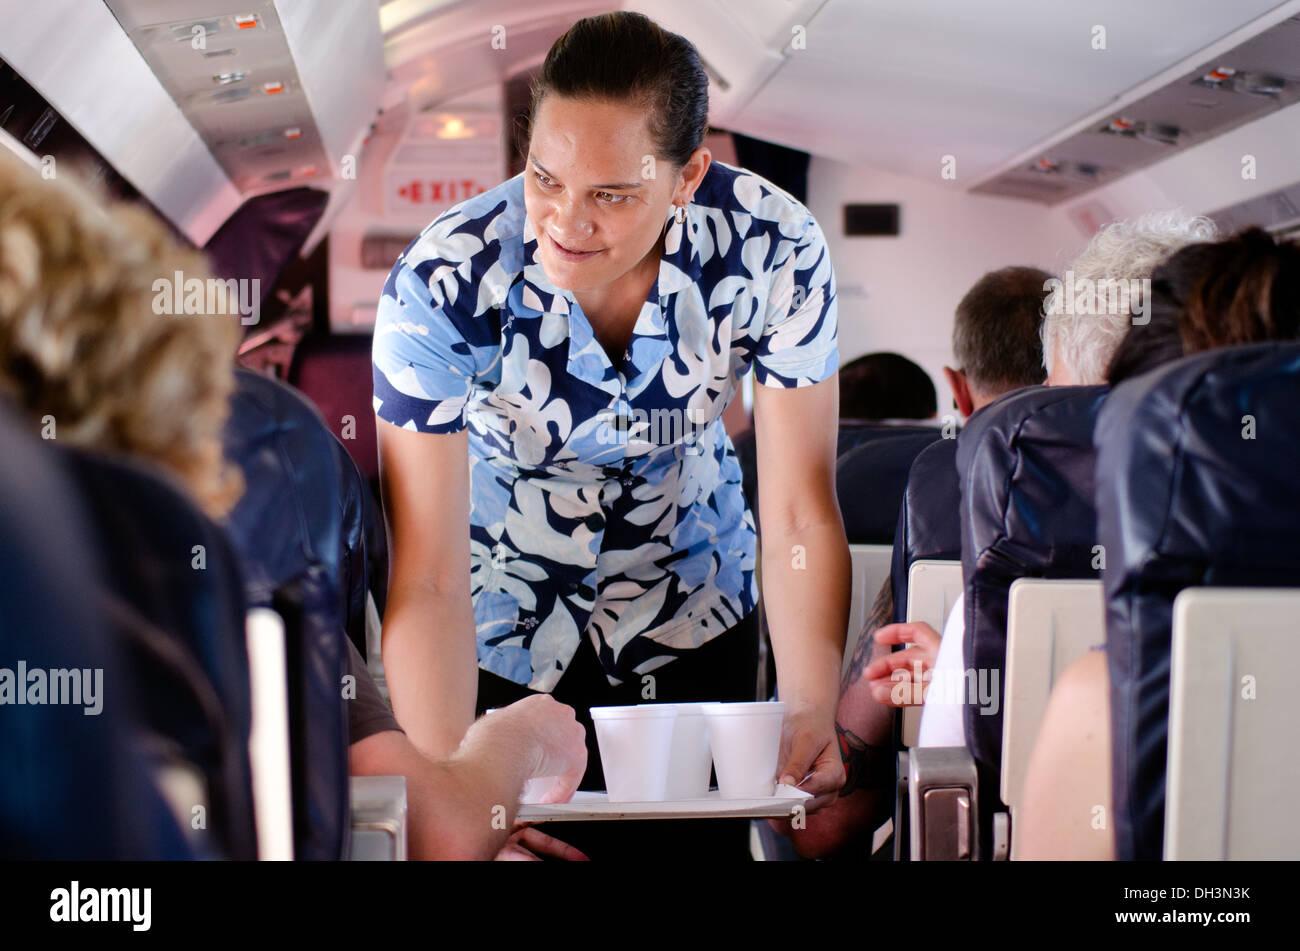 Air Rarotonga air hostess serves hot drinks during flight to Aitutaki lagoon Cook Islands - Stock Image